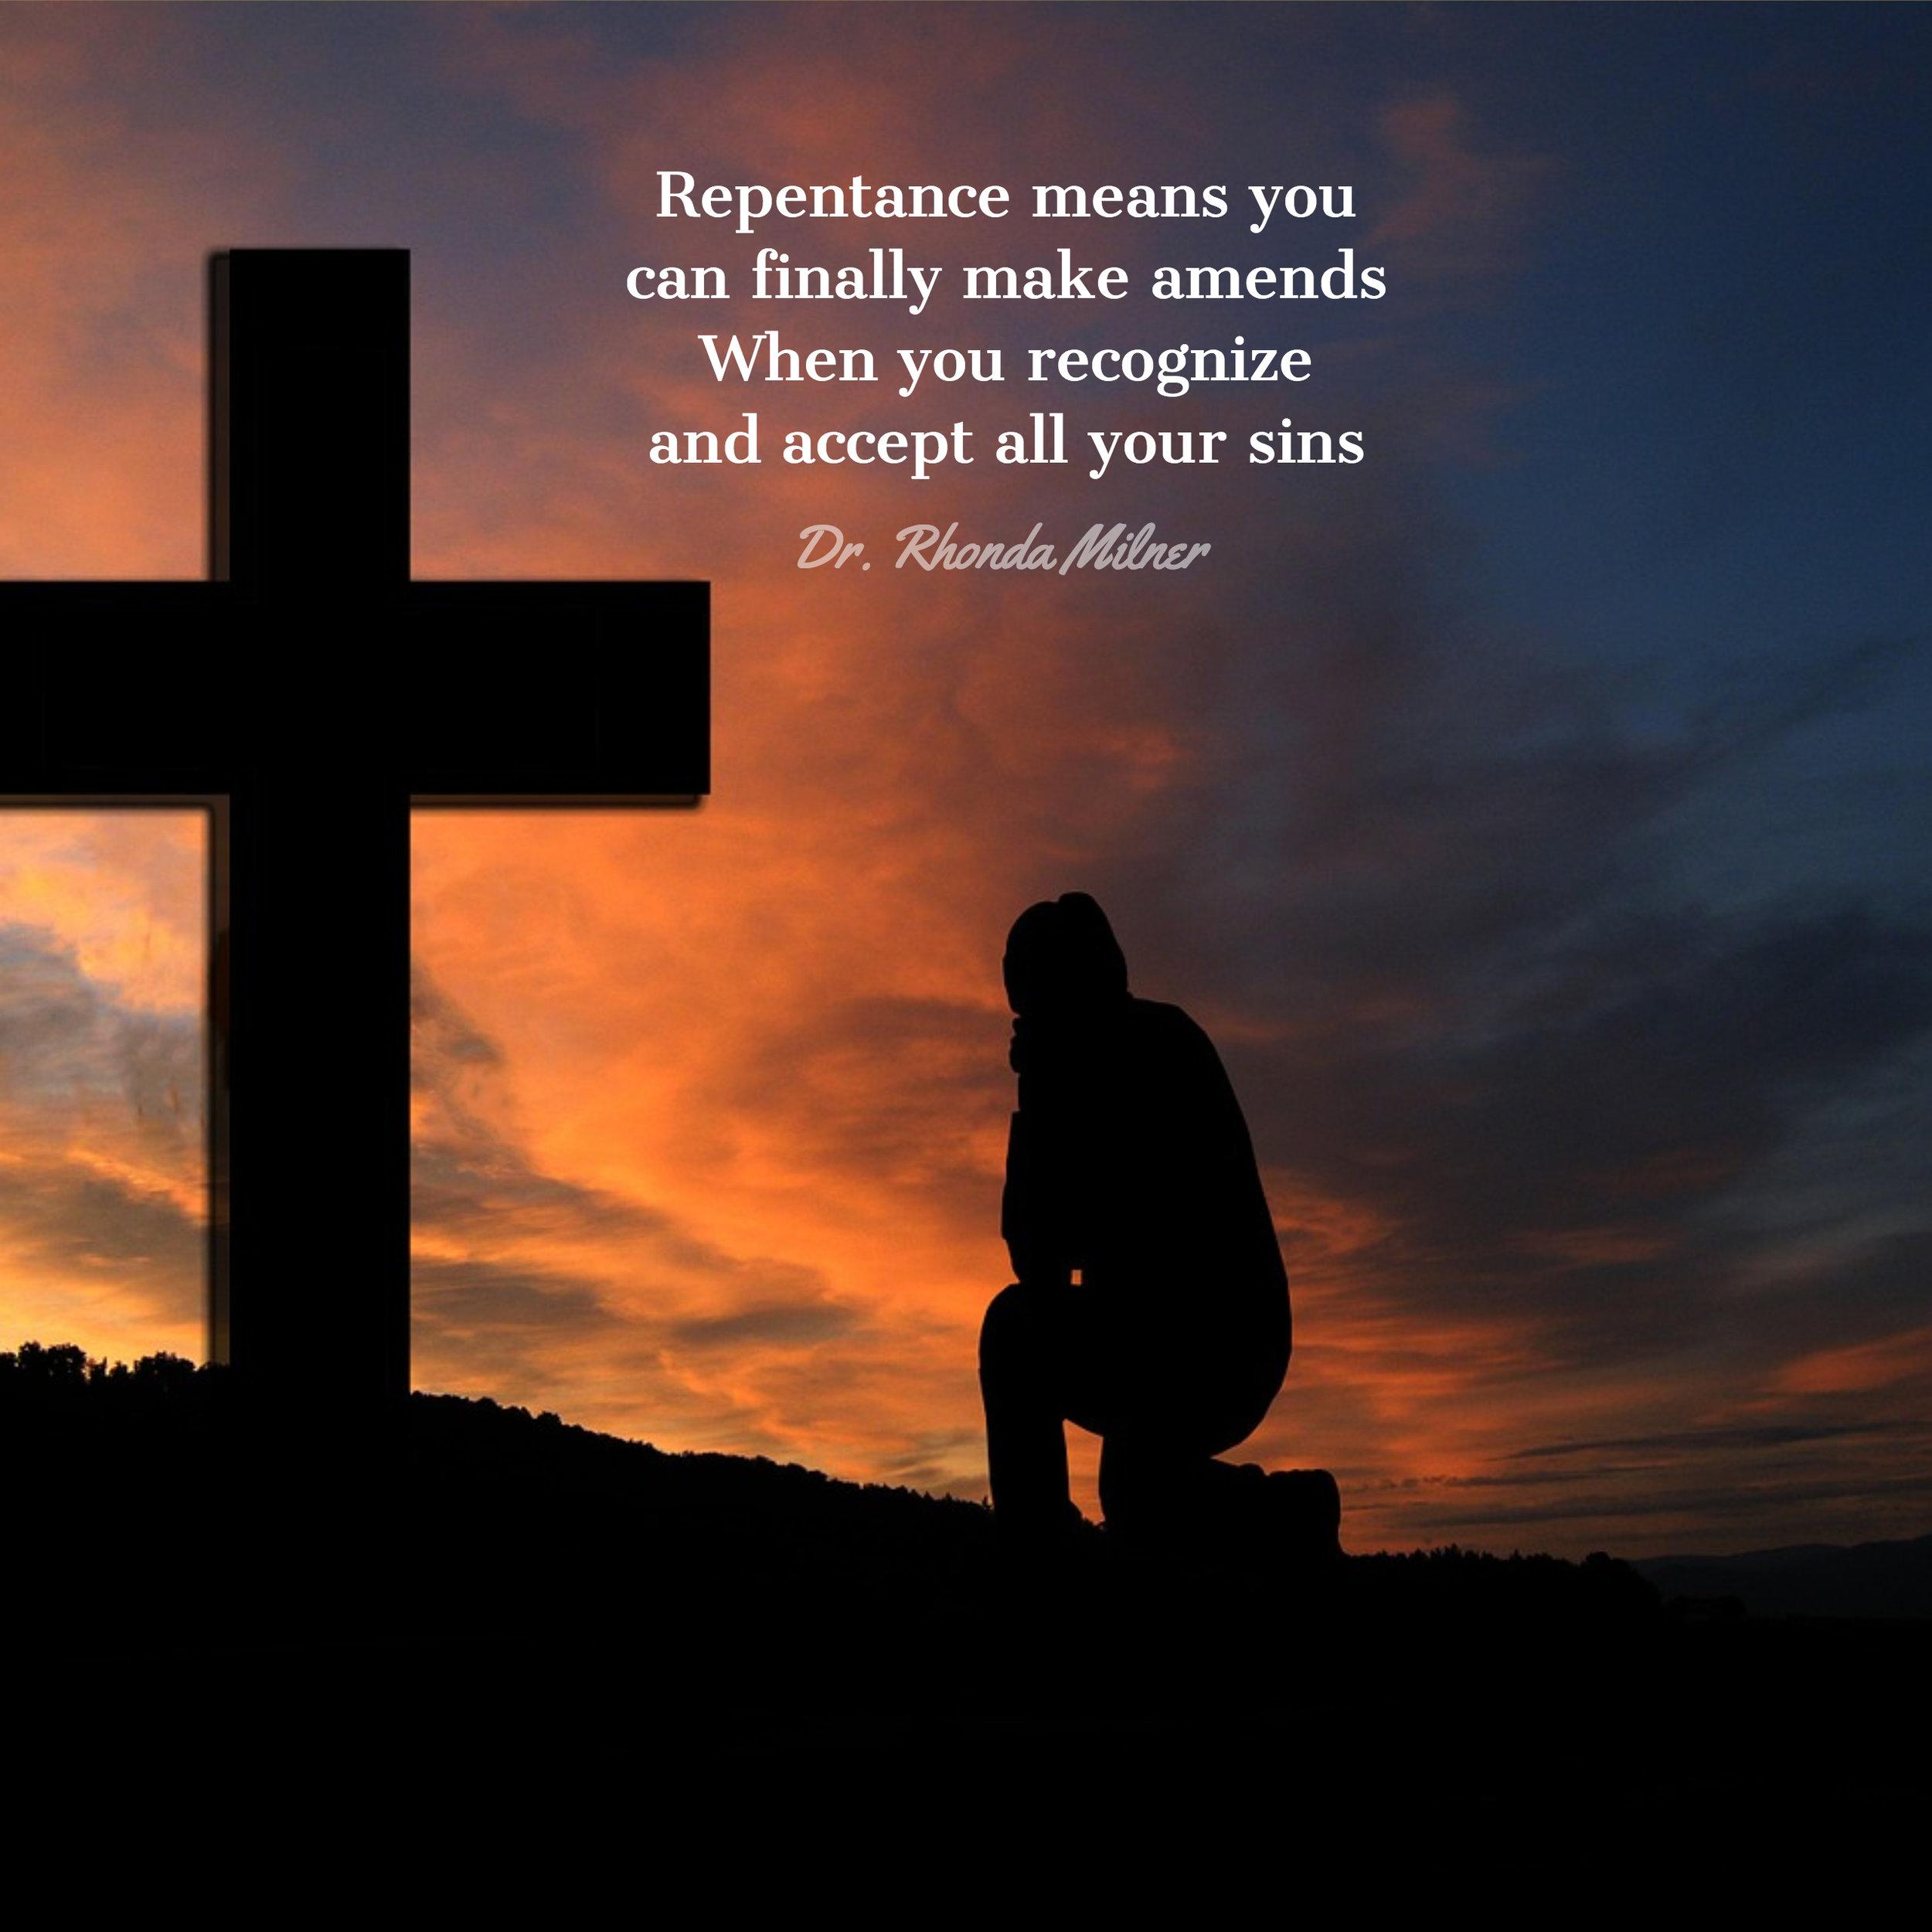 Repentance 1.jpg